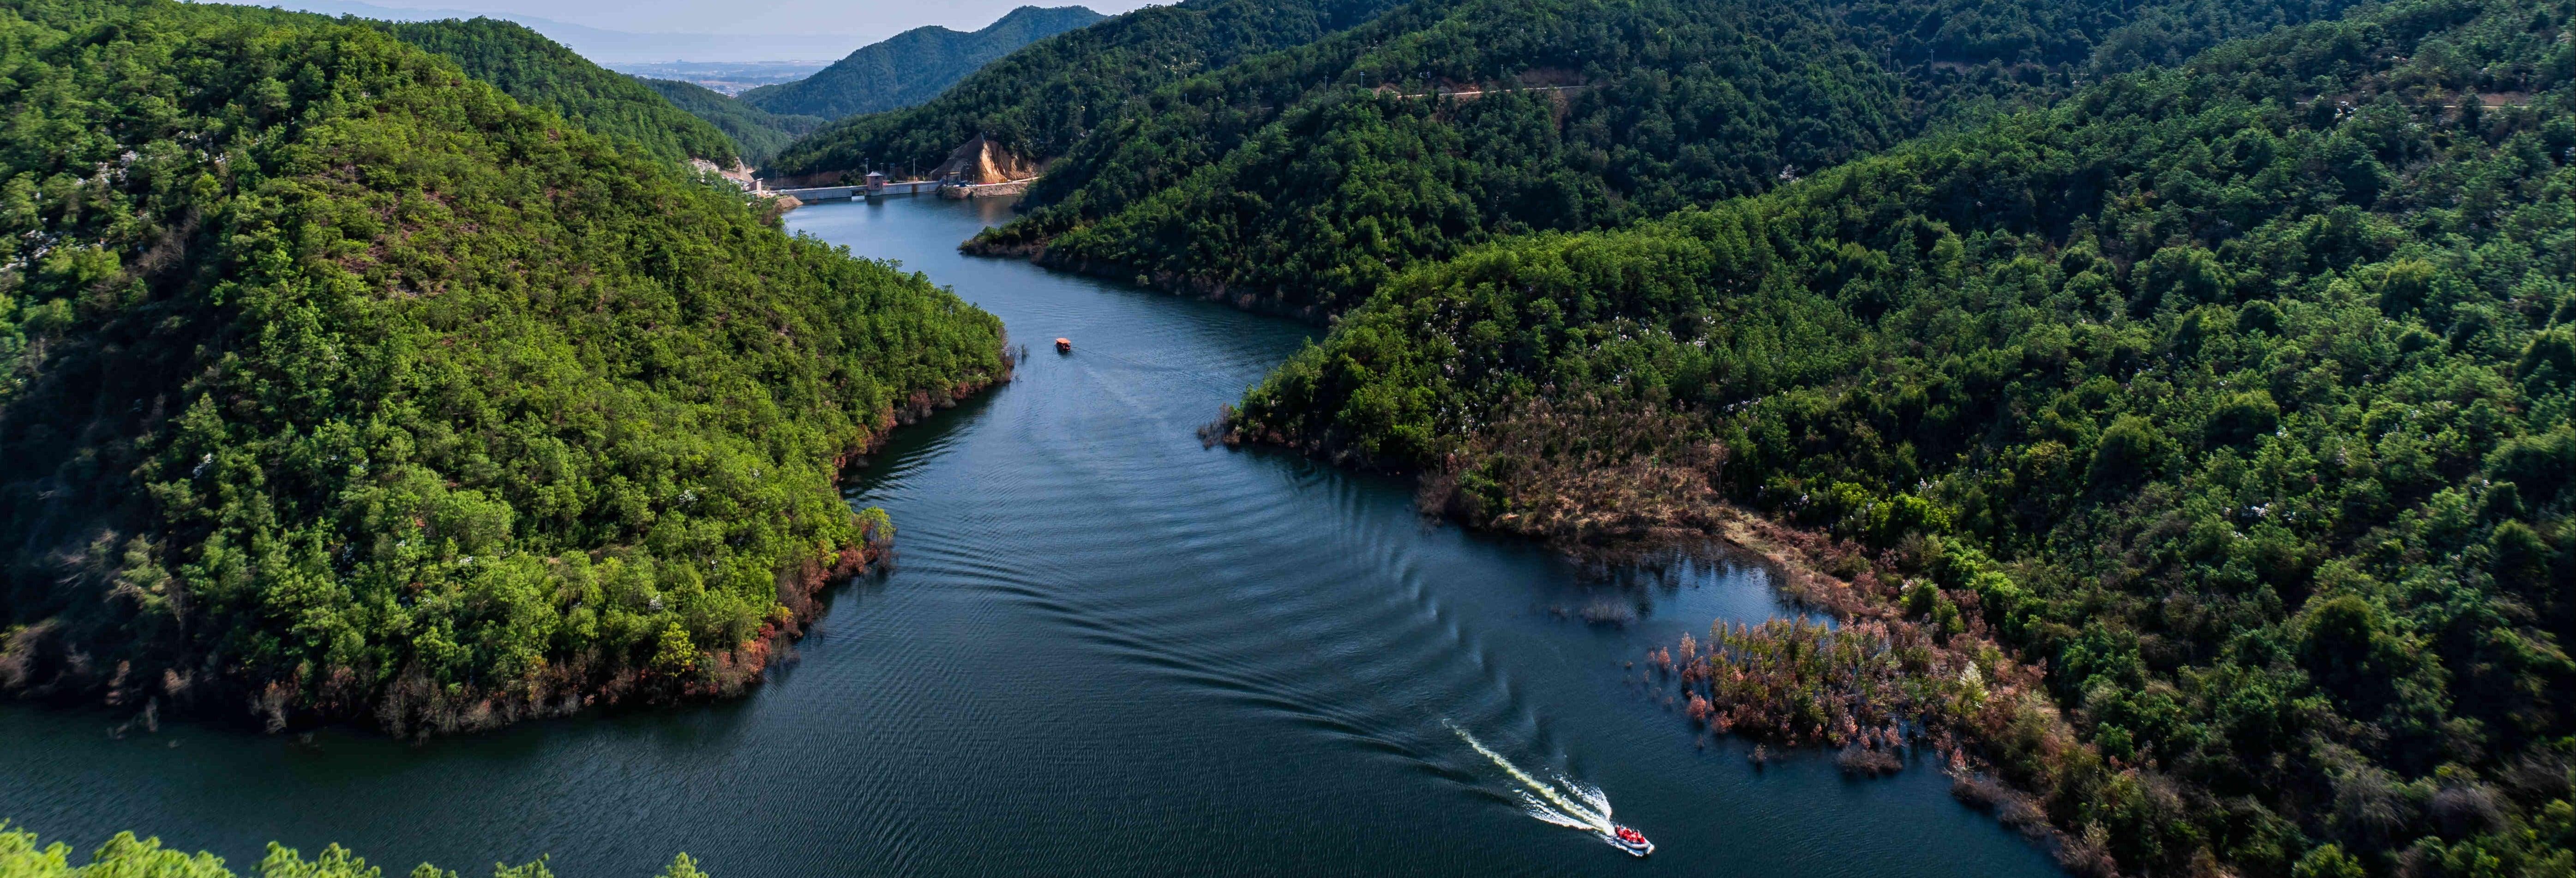 Tour en kayak por el Pirineo aragonés